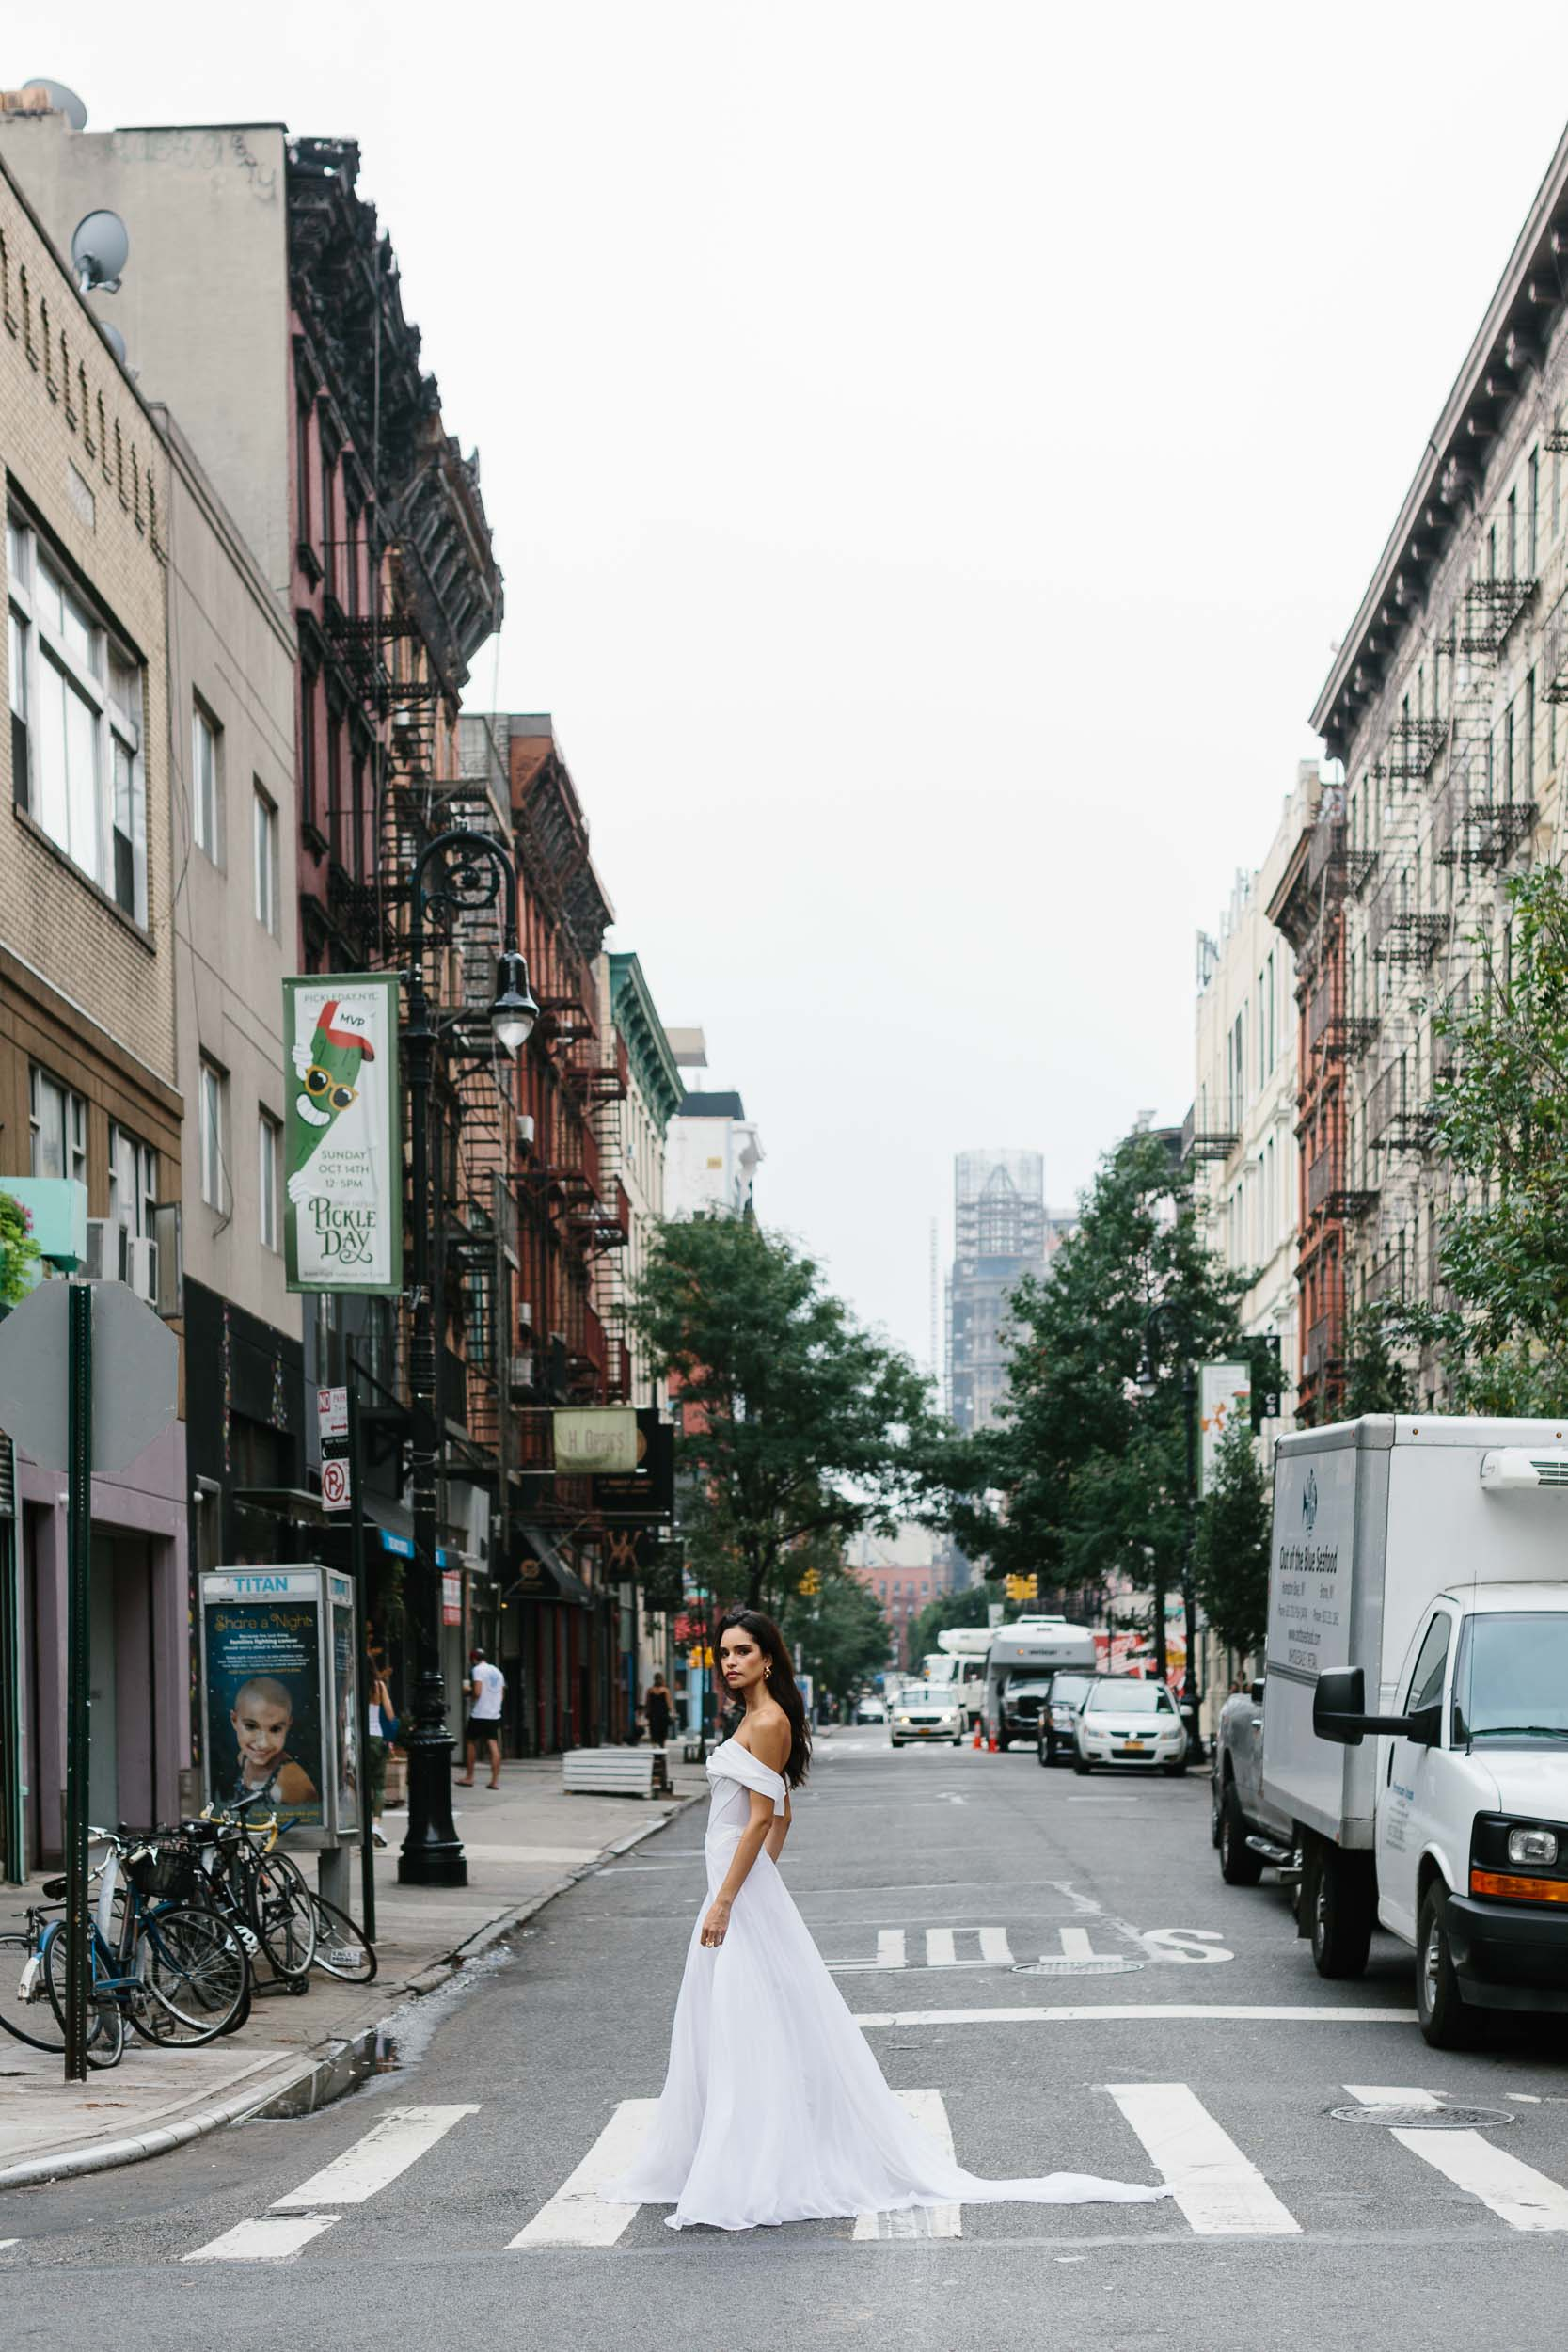 Kas-Richards-Fashion-Editorial-Photographer-New-York-Georgia-Young-Couture-12.jpg